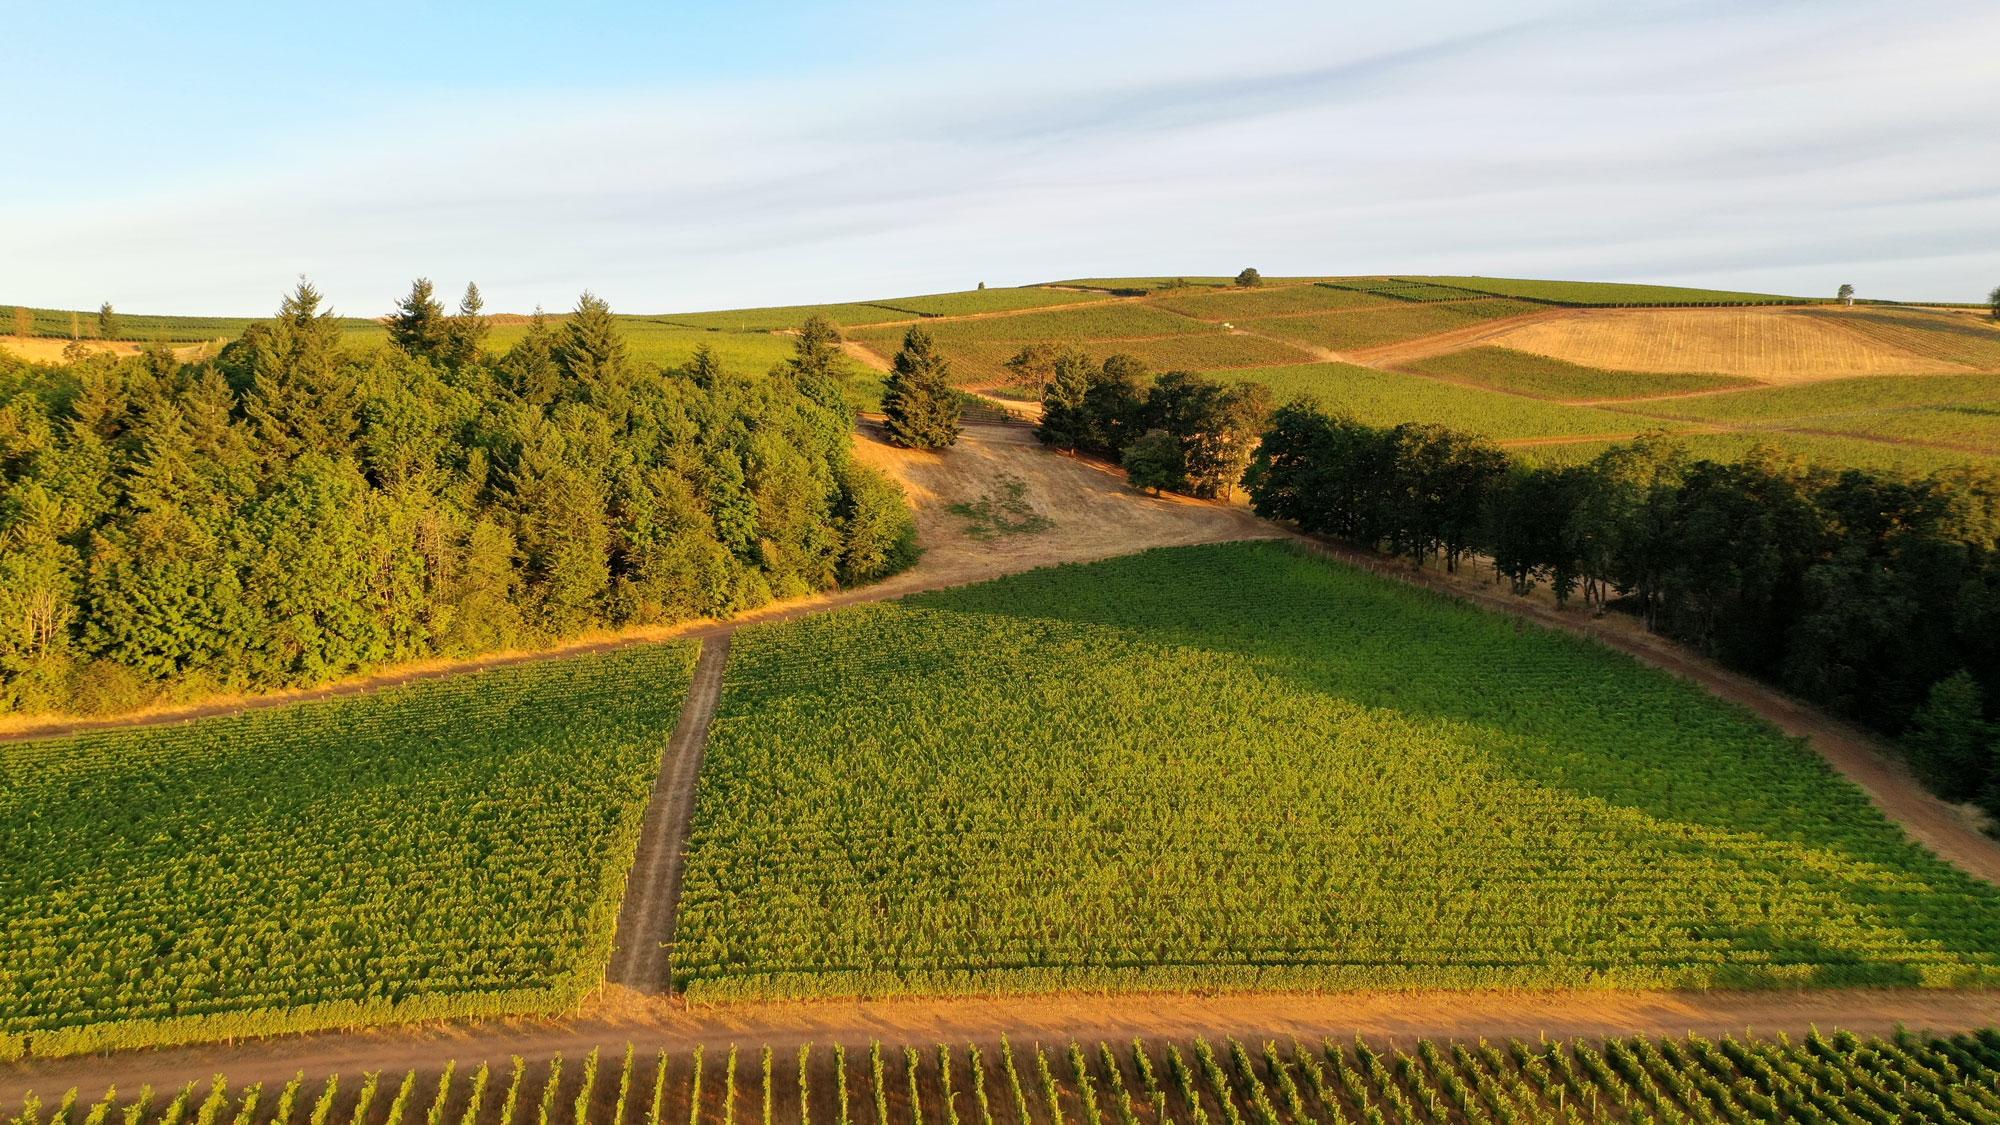 Cristom vineyard in the sunrise